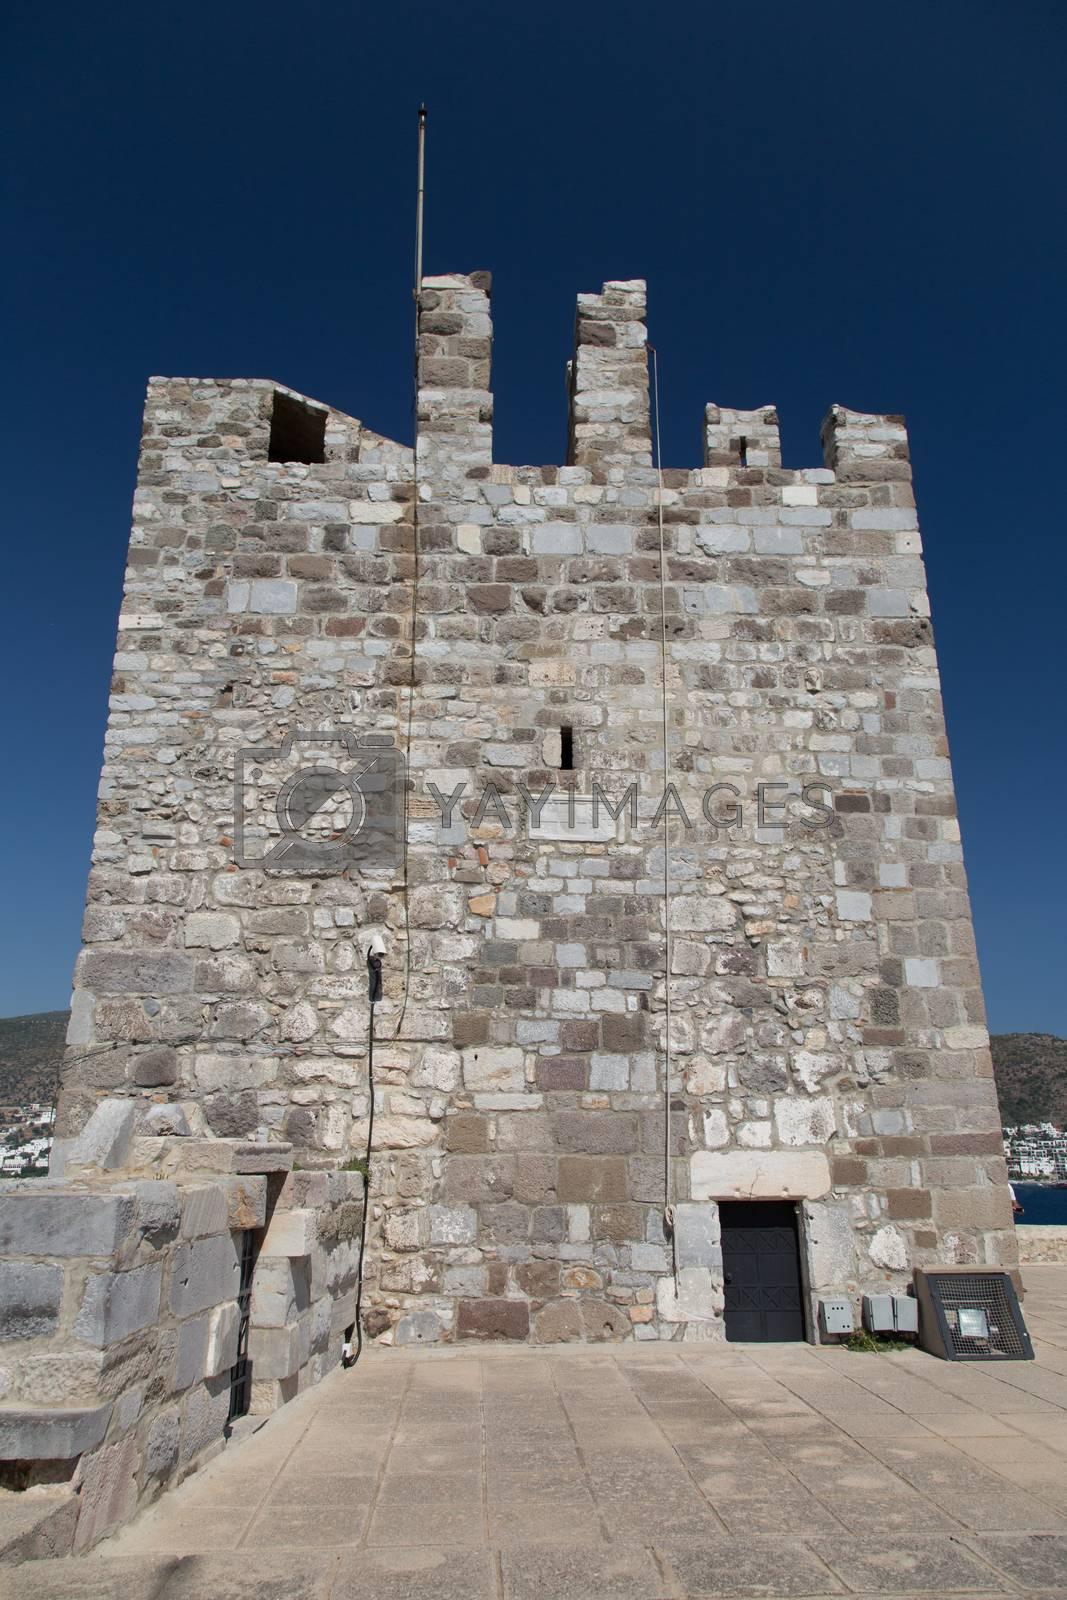 Tower of Bodrum Castle by EvrenKalinbacak